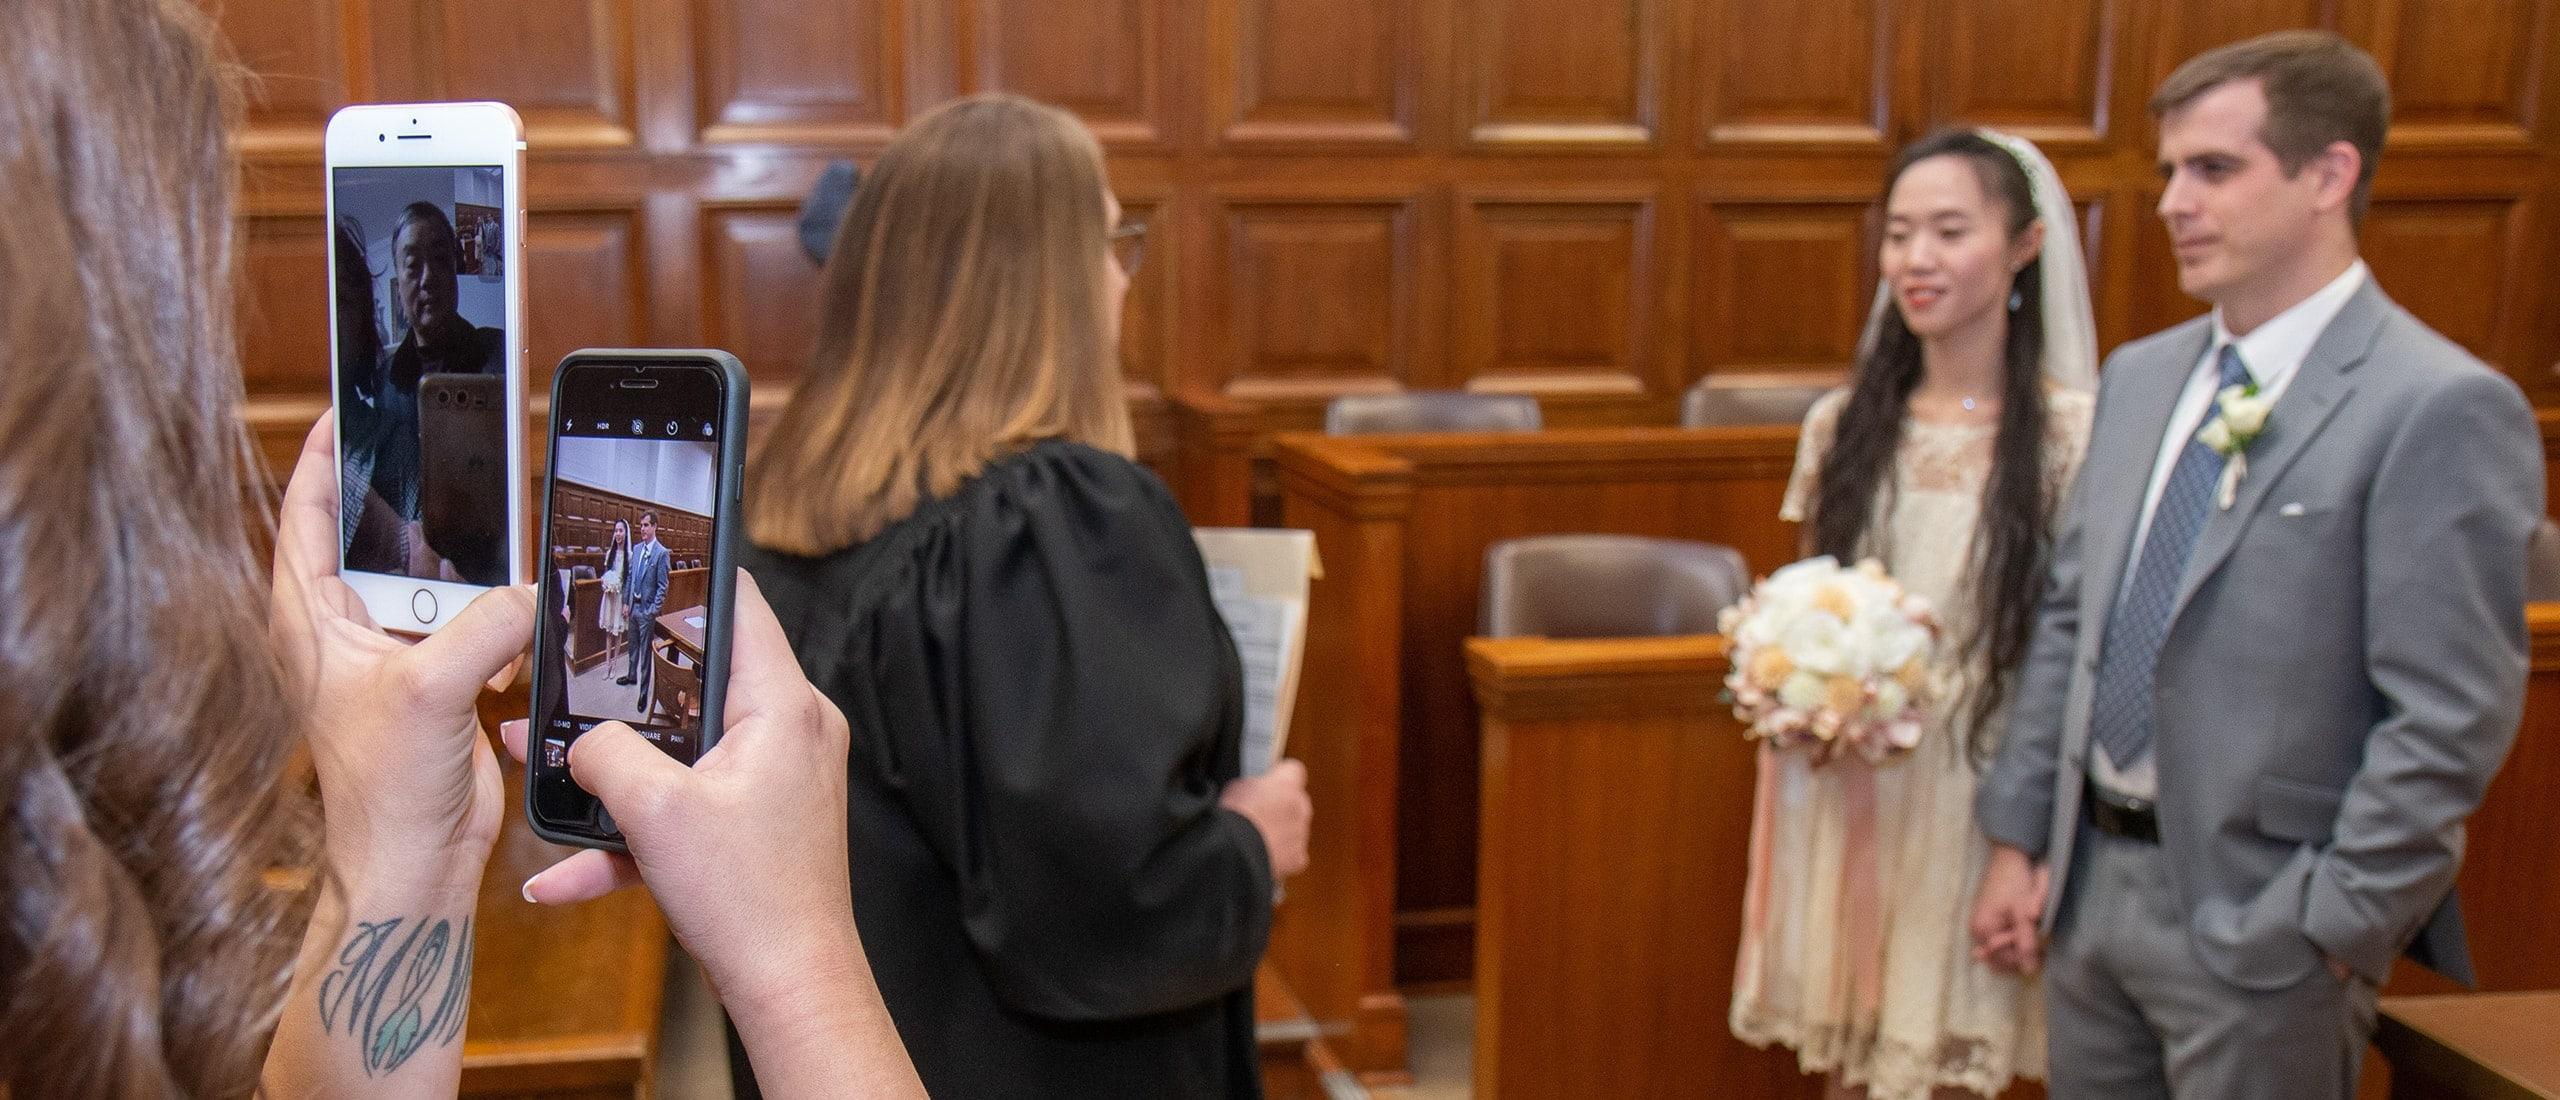 Courthouse Wedding Photographer Milwaukee WI R